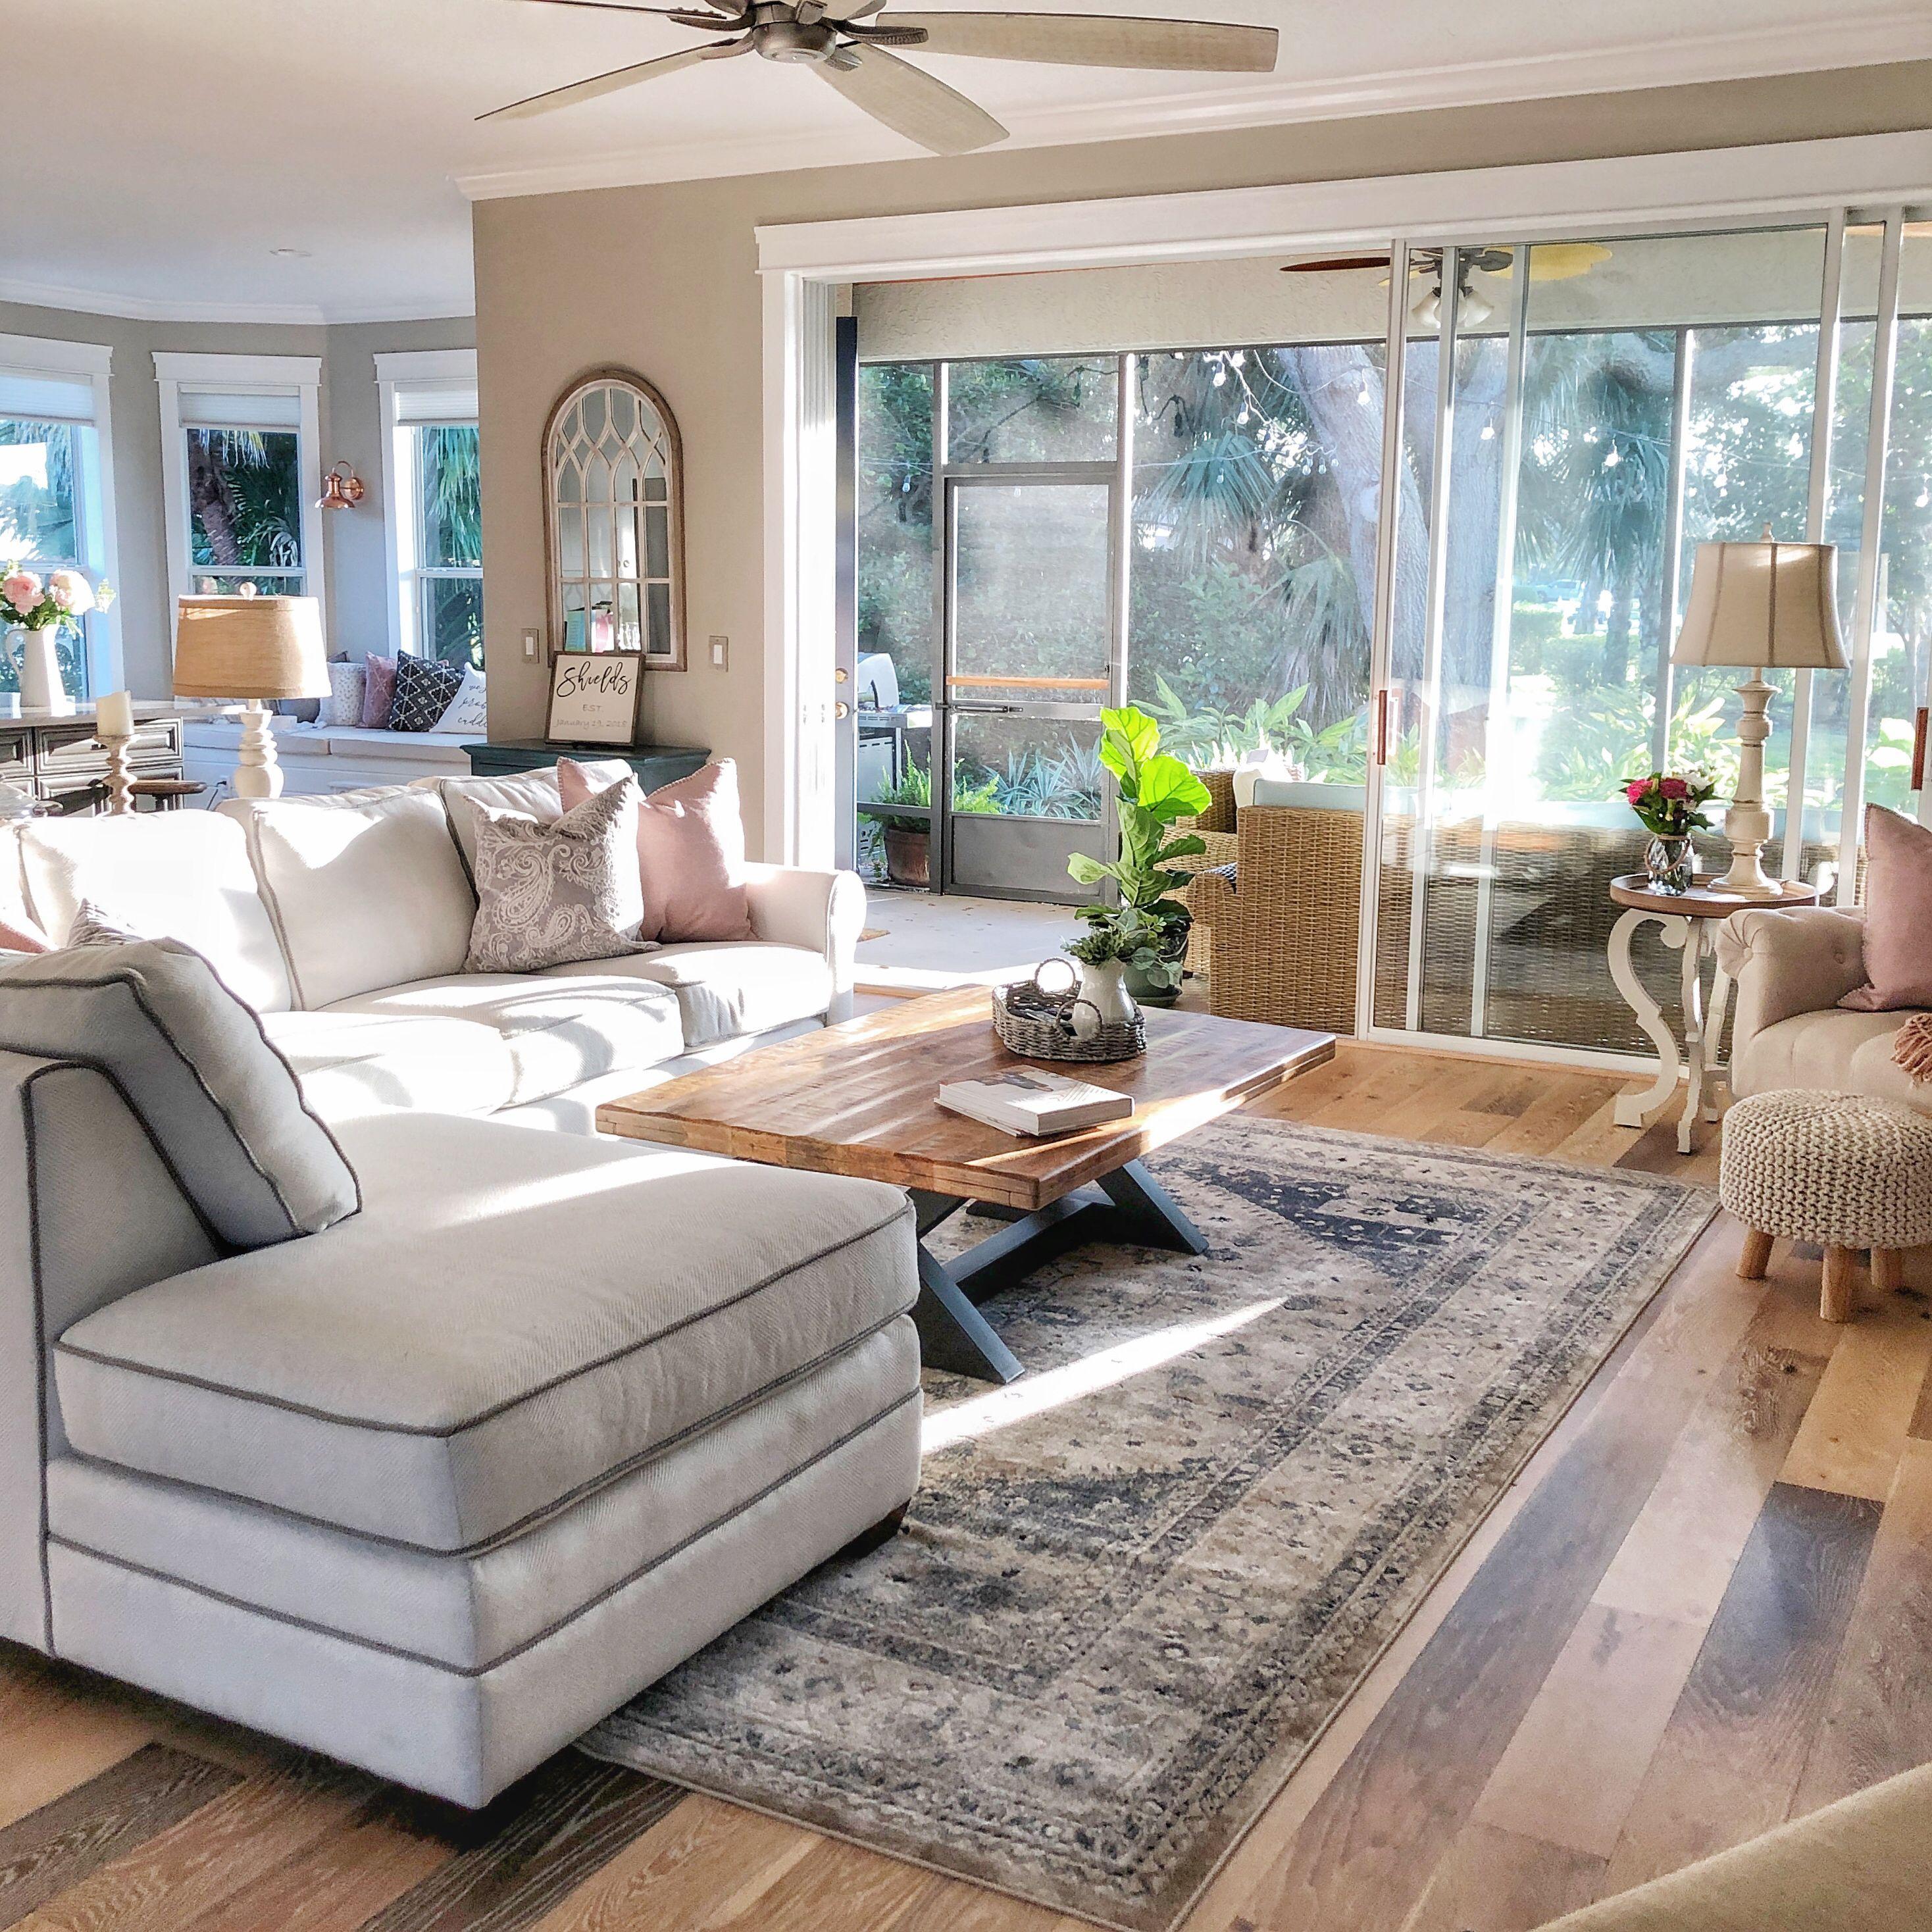 Braxton Culler Bedford Bumper Sectional Sofa Cabin Living Room